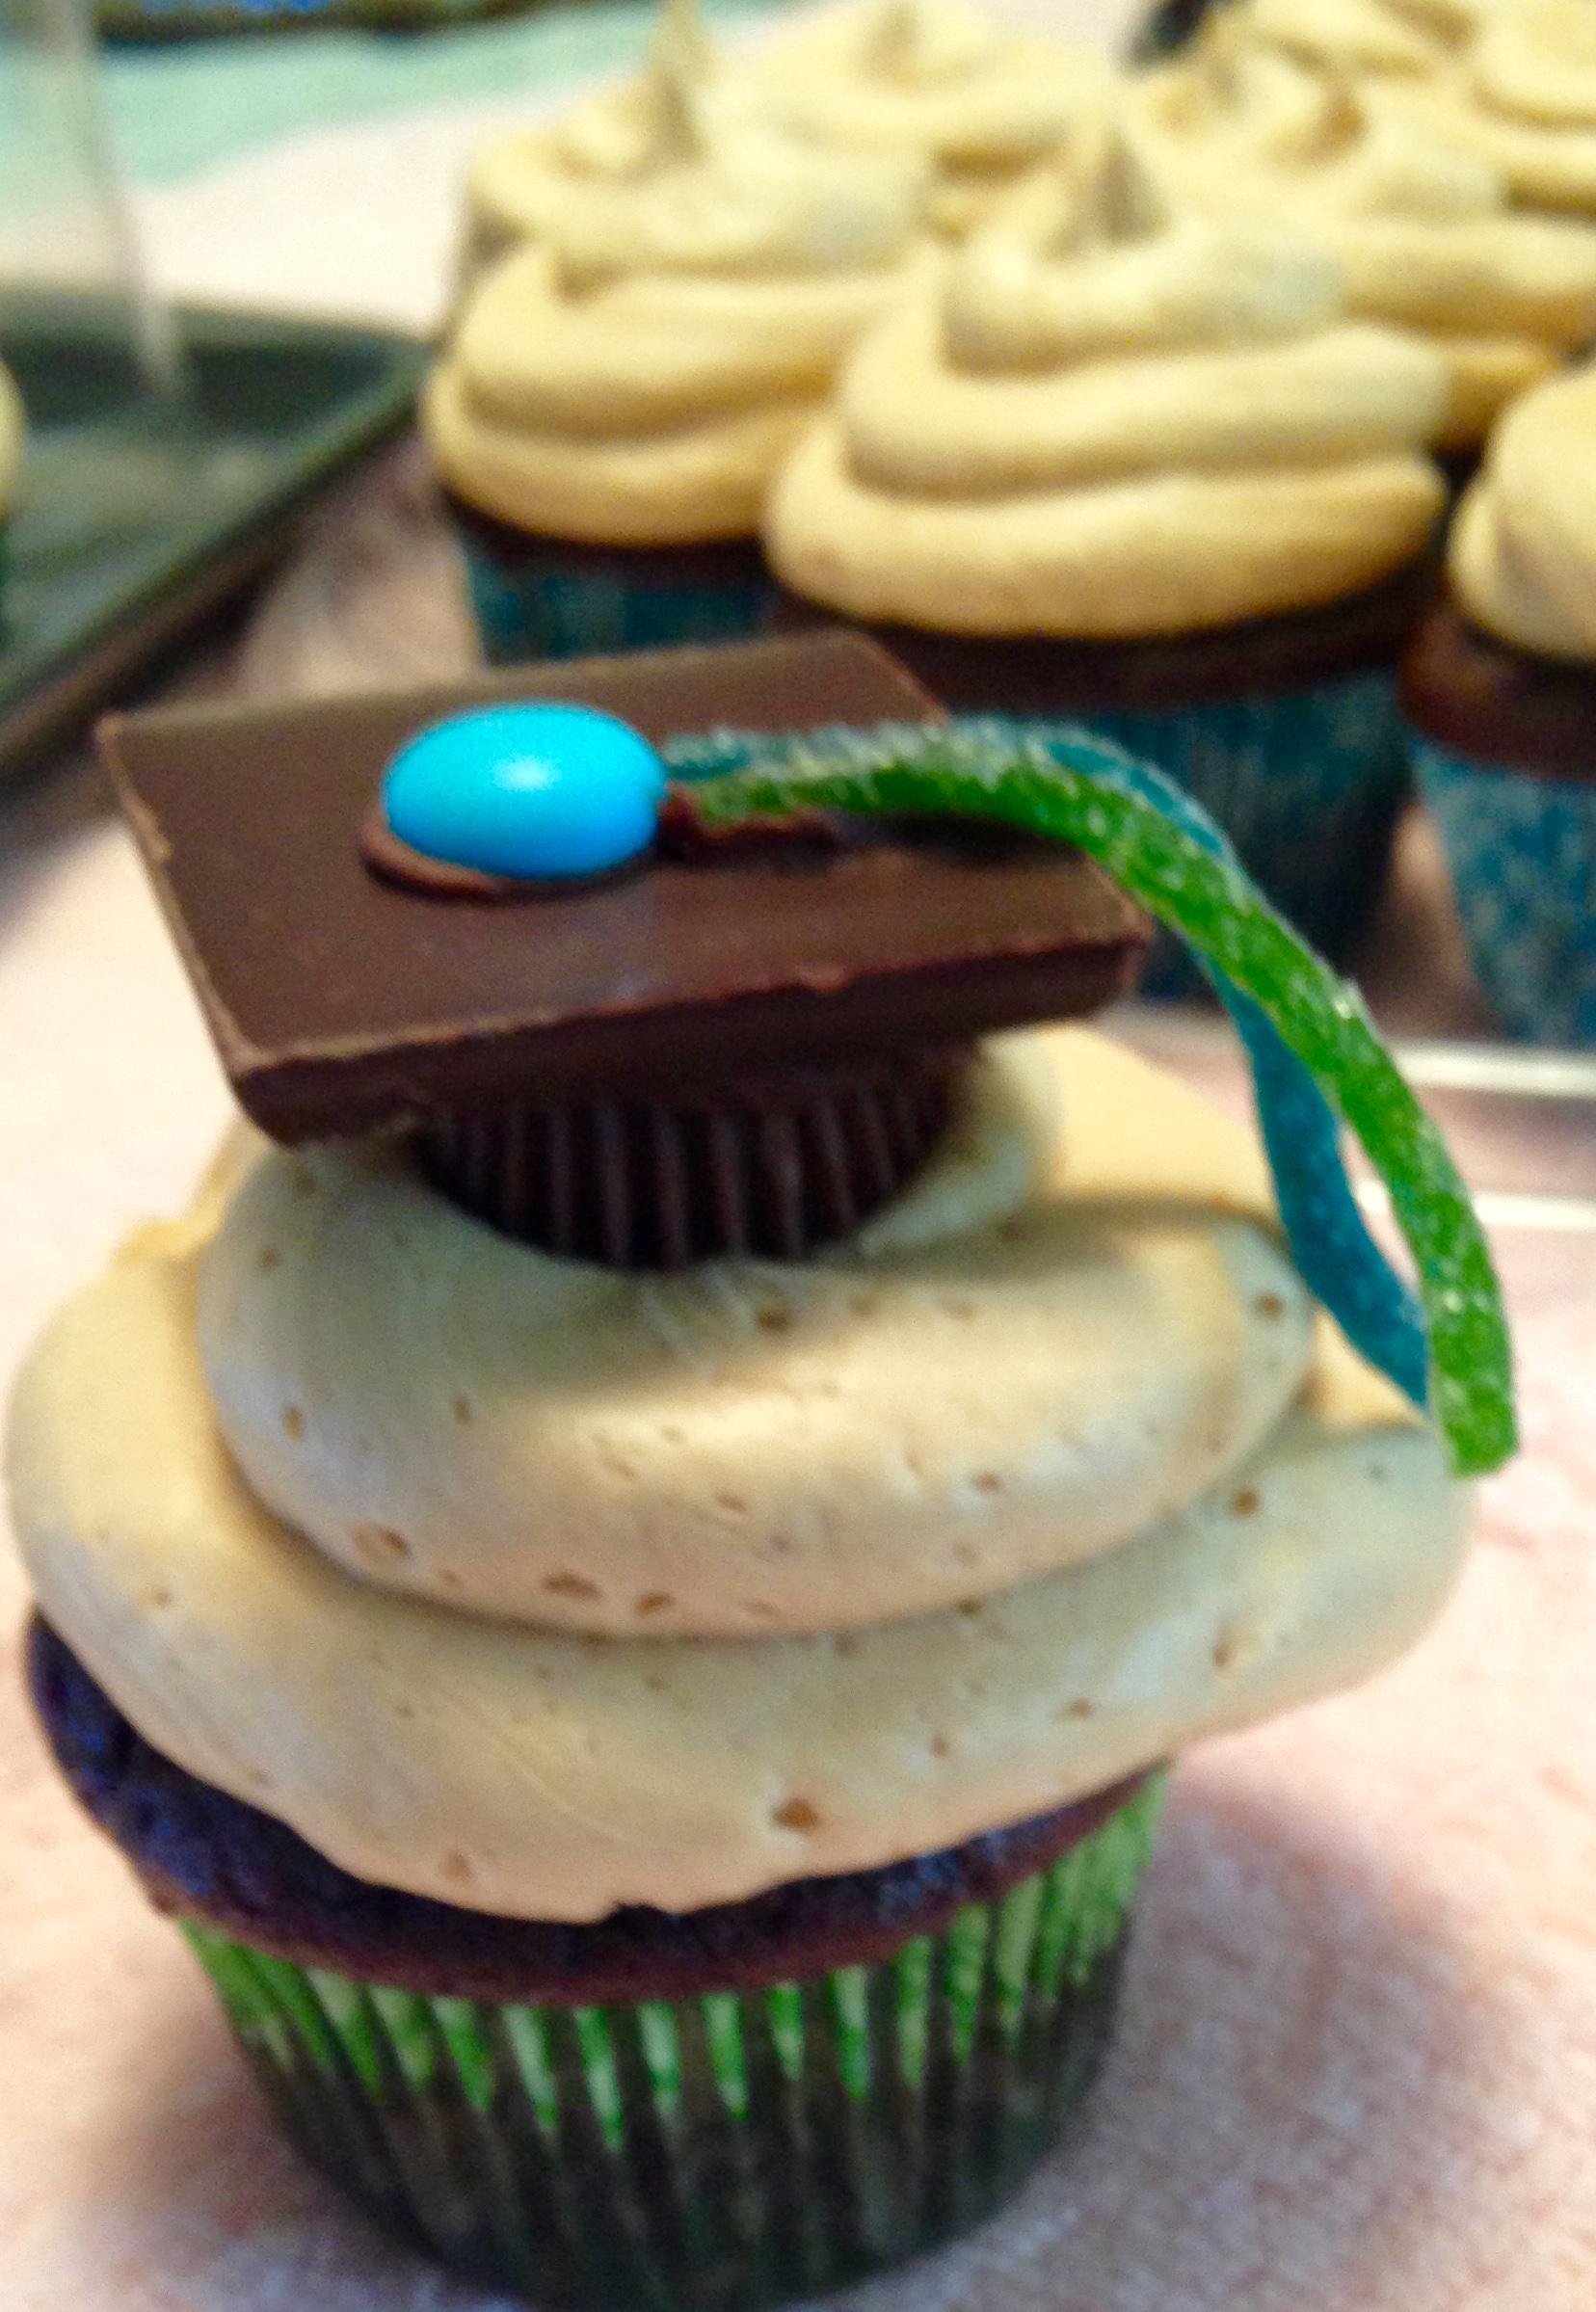 Gluten-Free Graduation Cupcakes